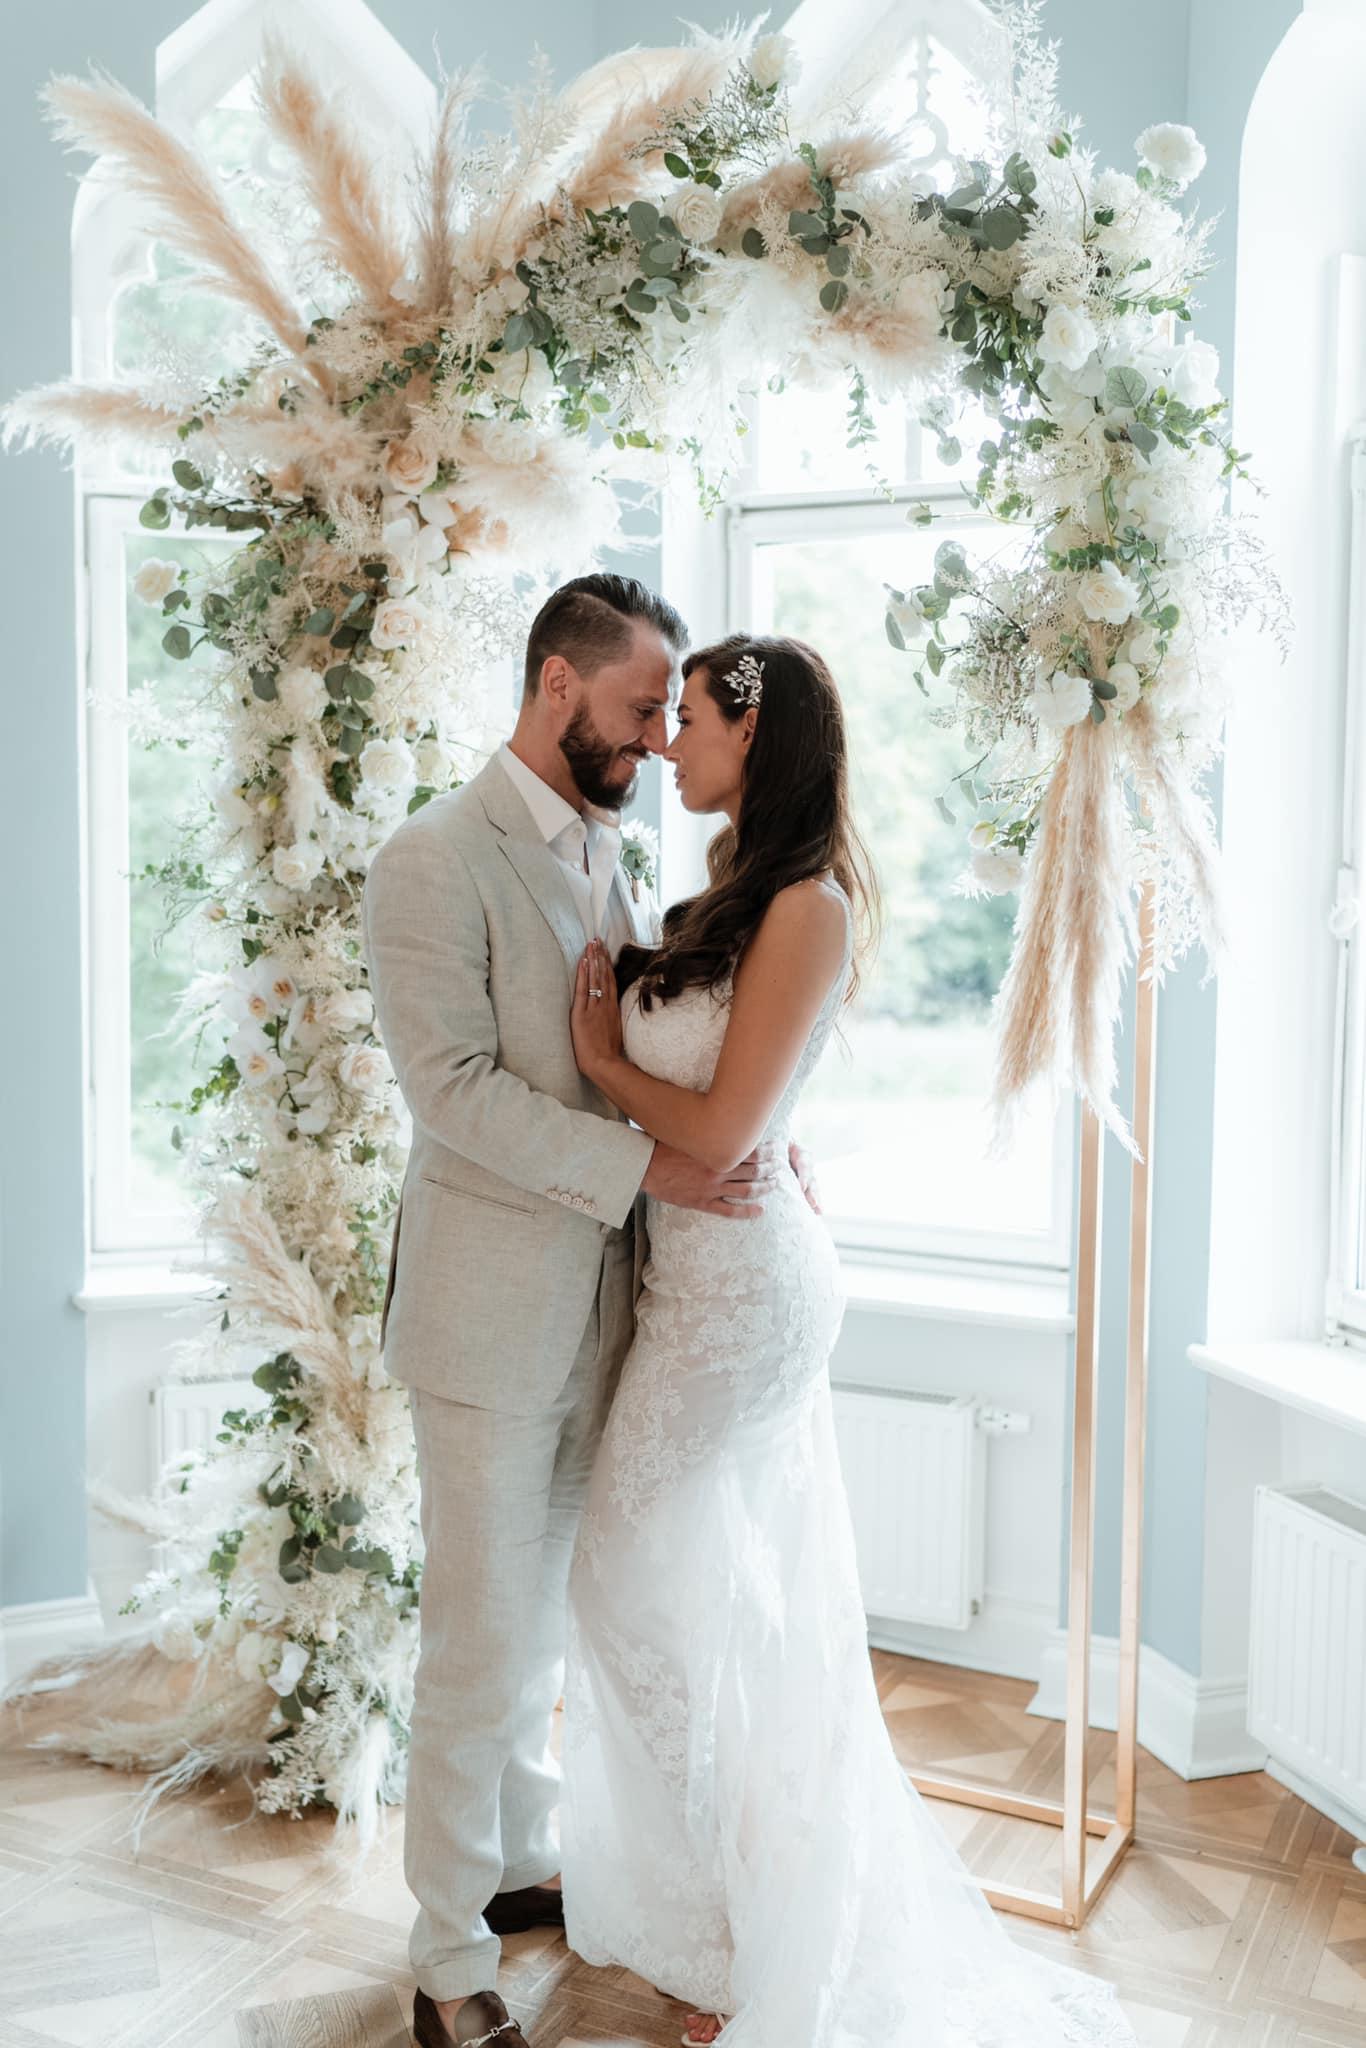 Wedding Award Germany 2021 - Brautpaar vor Traubogen